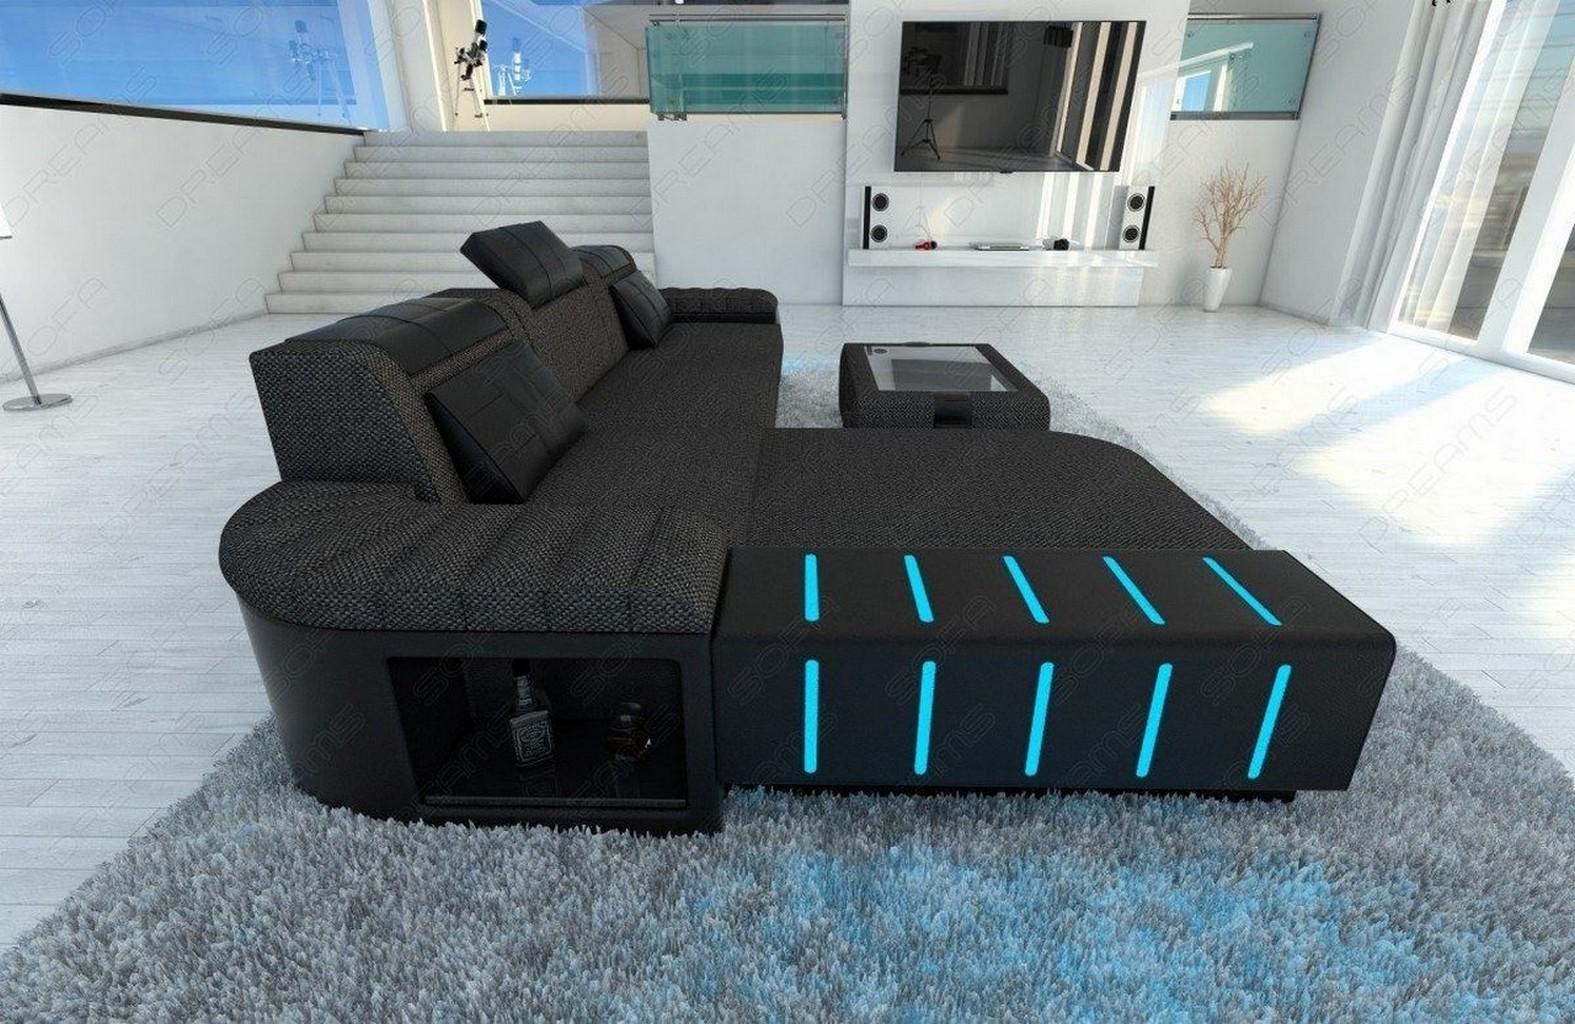 Wundervoll Sofa In L Form Sammlung Von Article Description